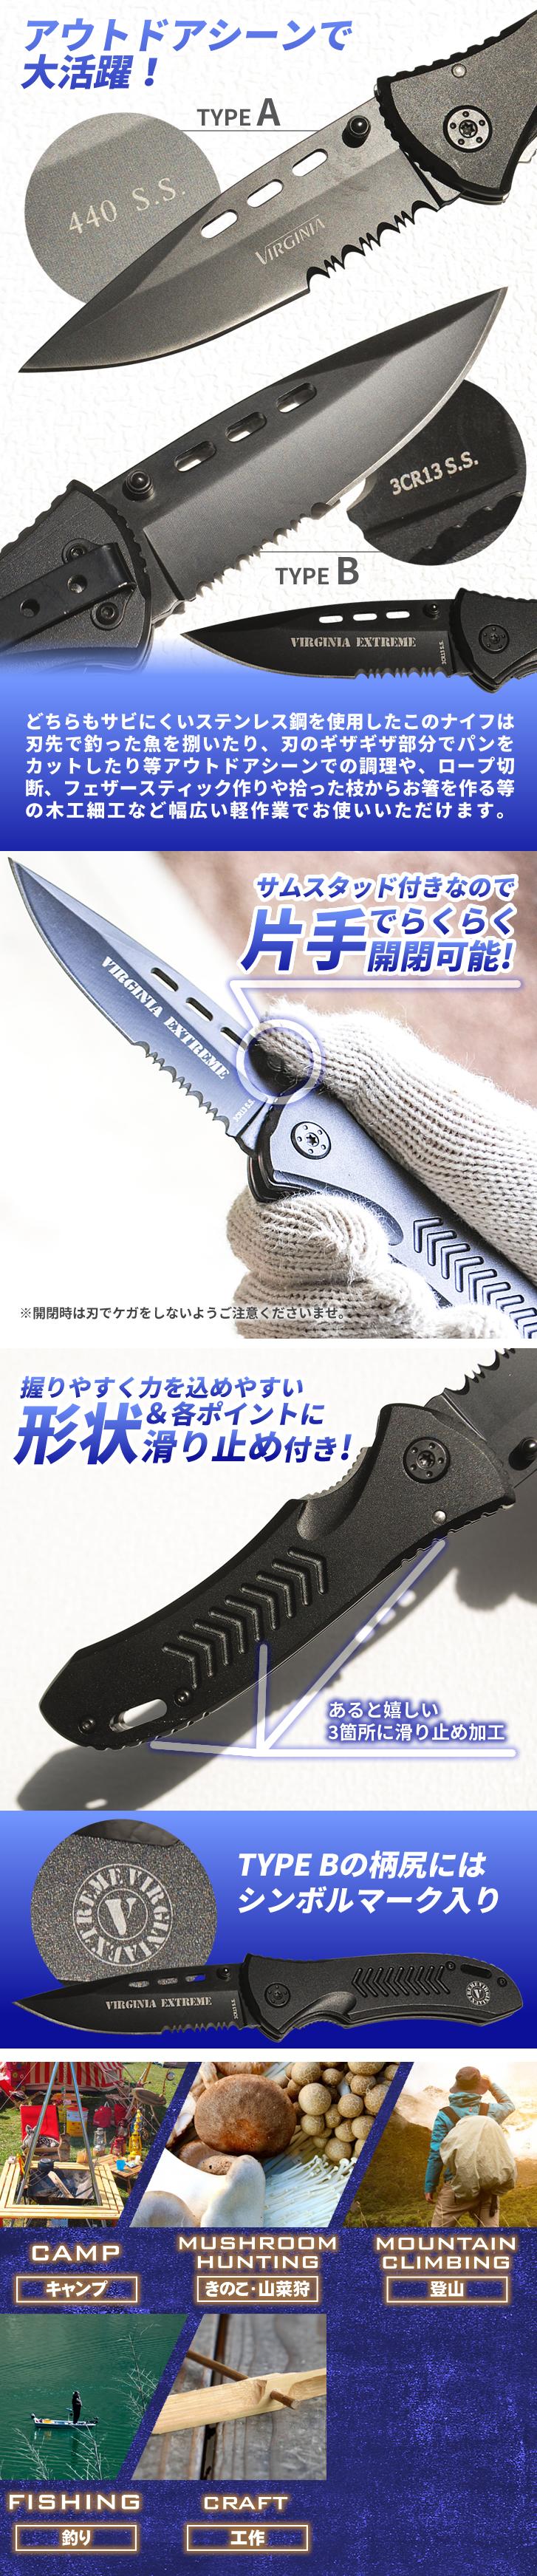 VIRGINIA Folding knife